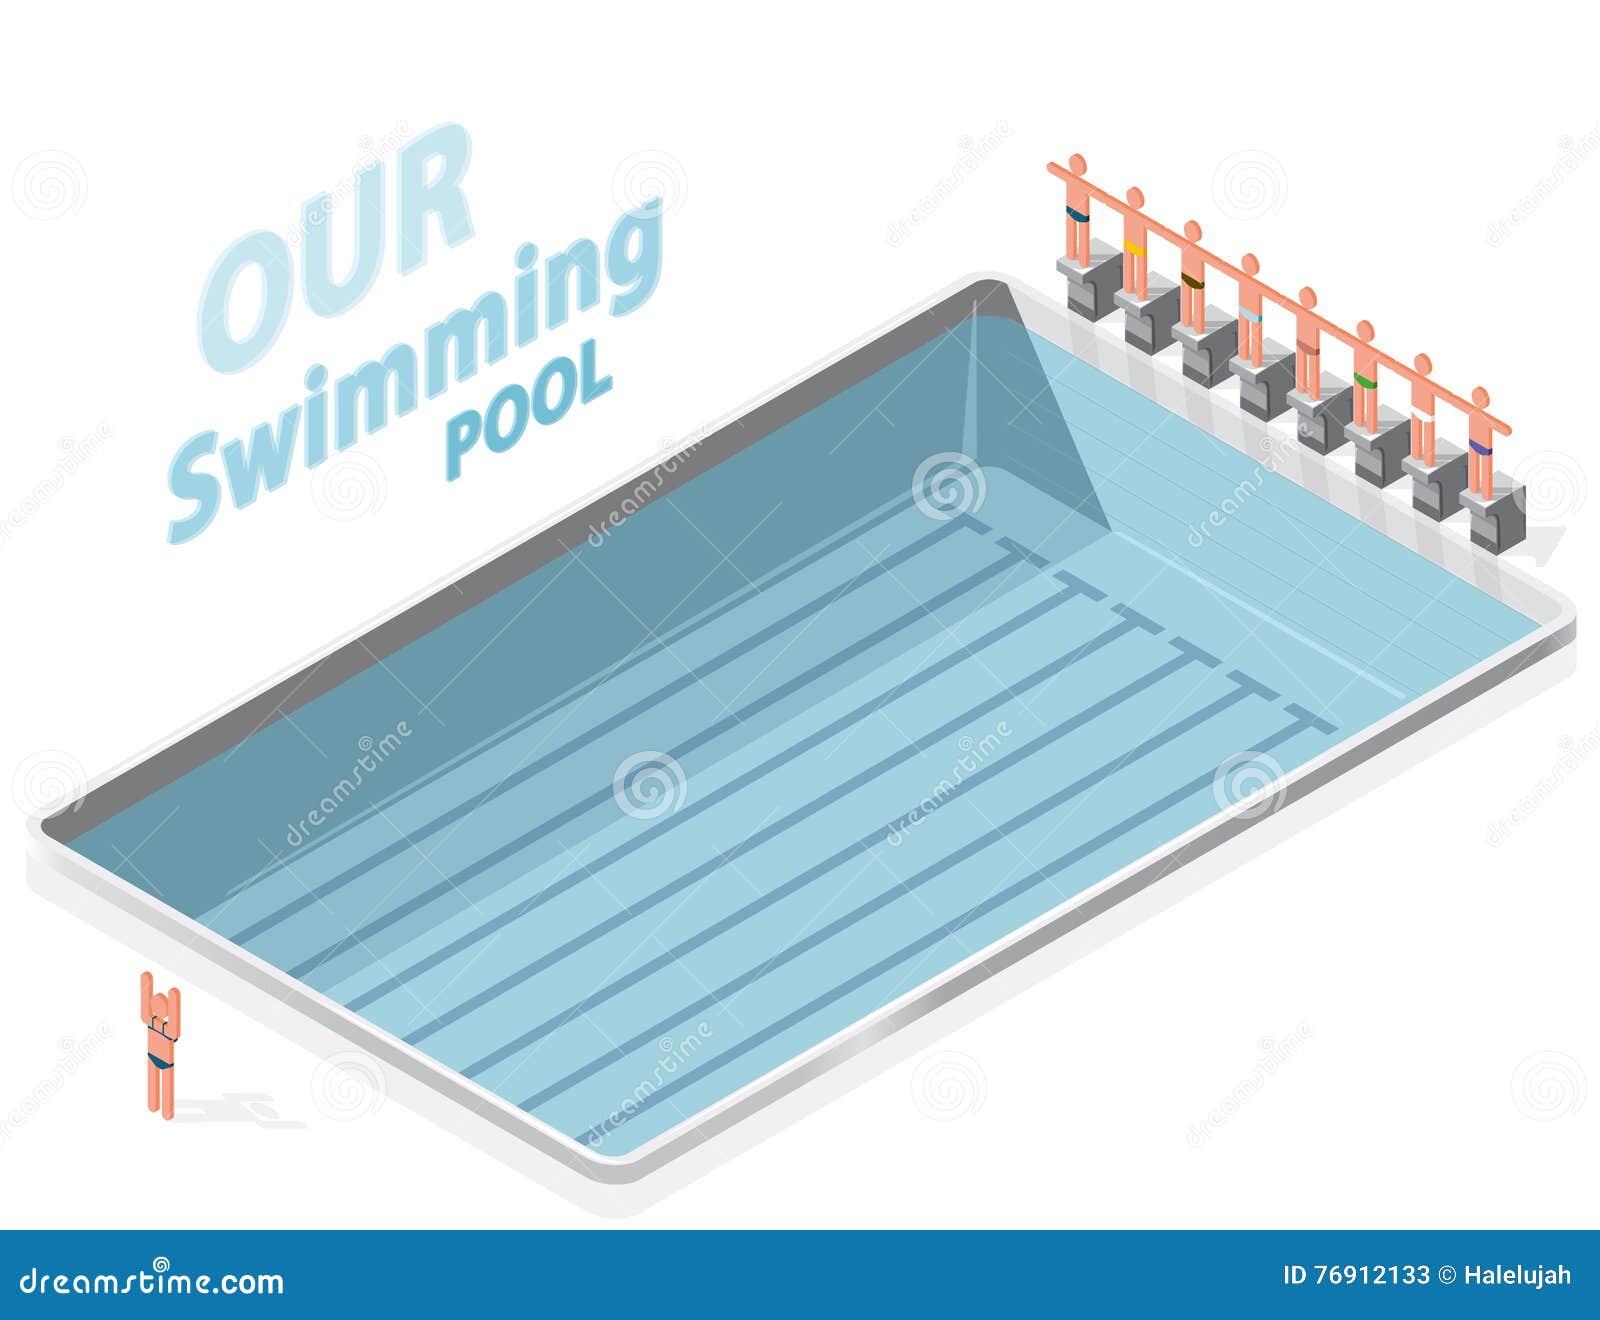 Inground Pool Schematics Isometric - Circuit Connection Diagram •